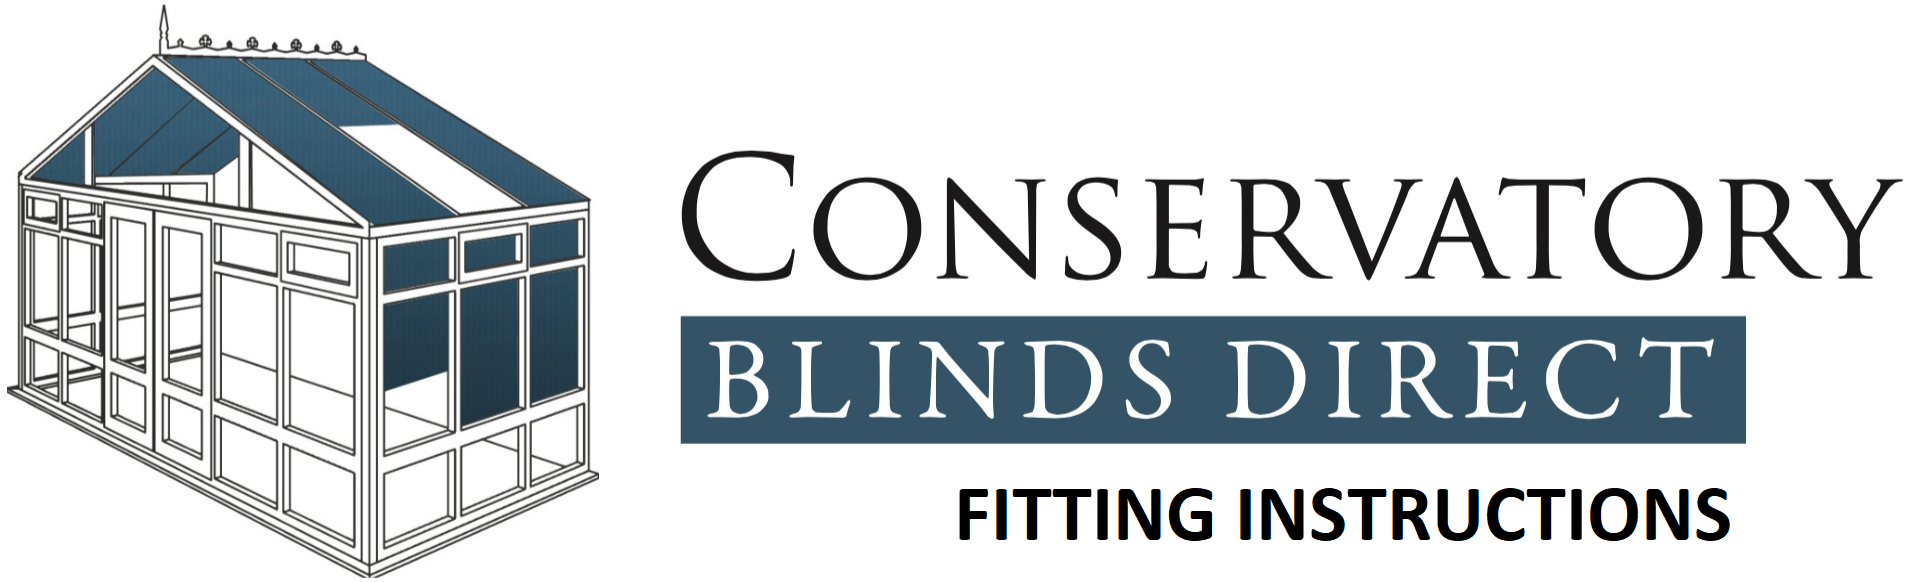 Checkatrade information for Instyle Blinds Ltd